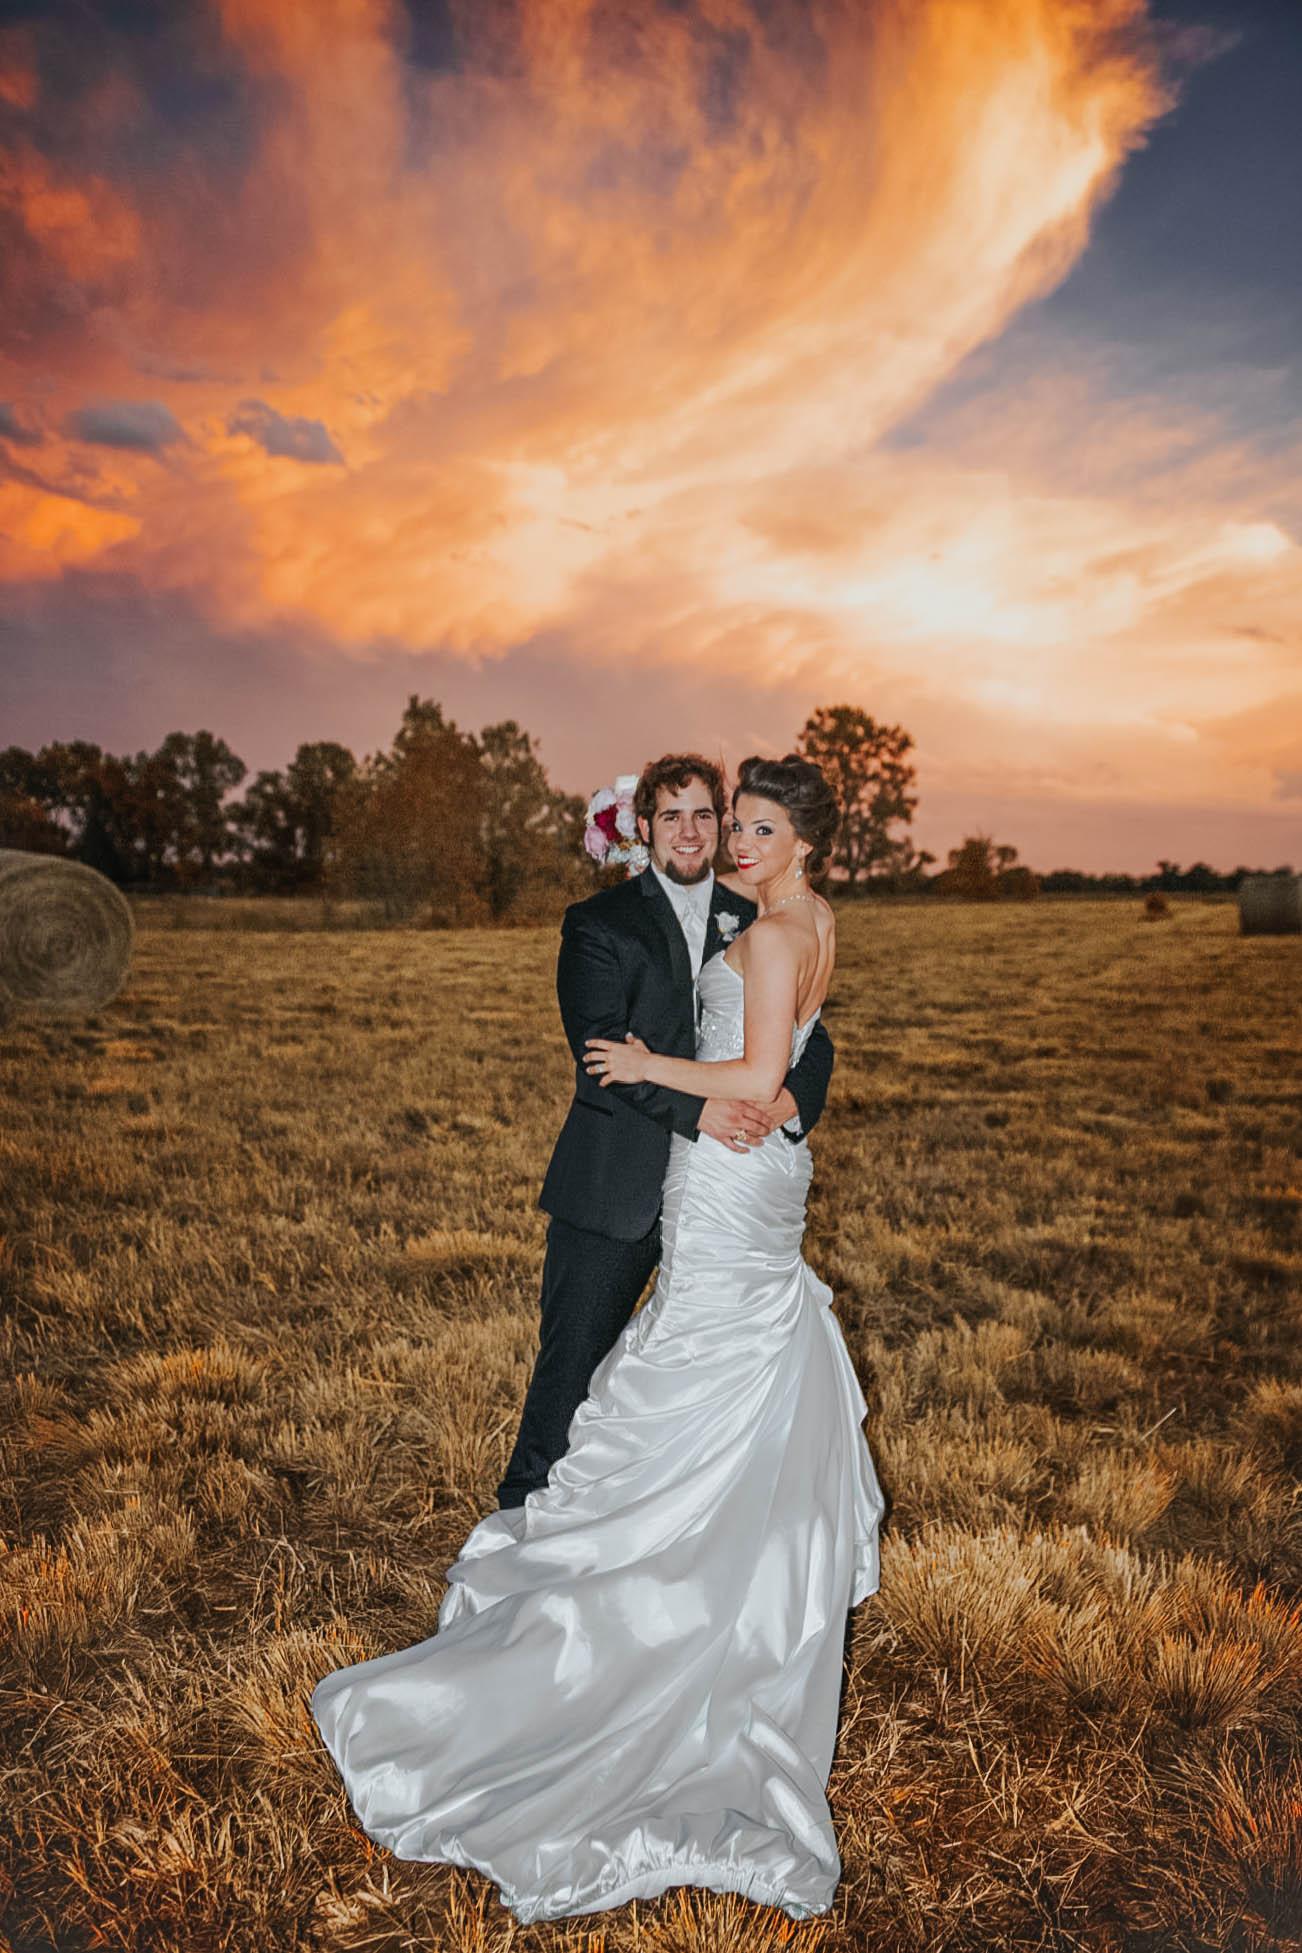 Whidbey-Island-Wedding-Photographer-J-Hodges (4 of 8)-2.jpg